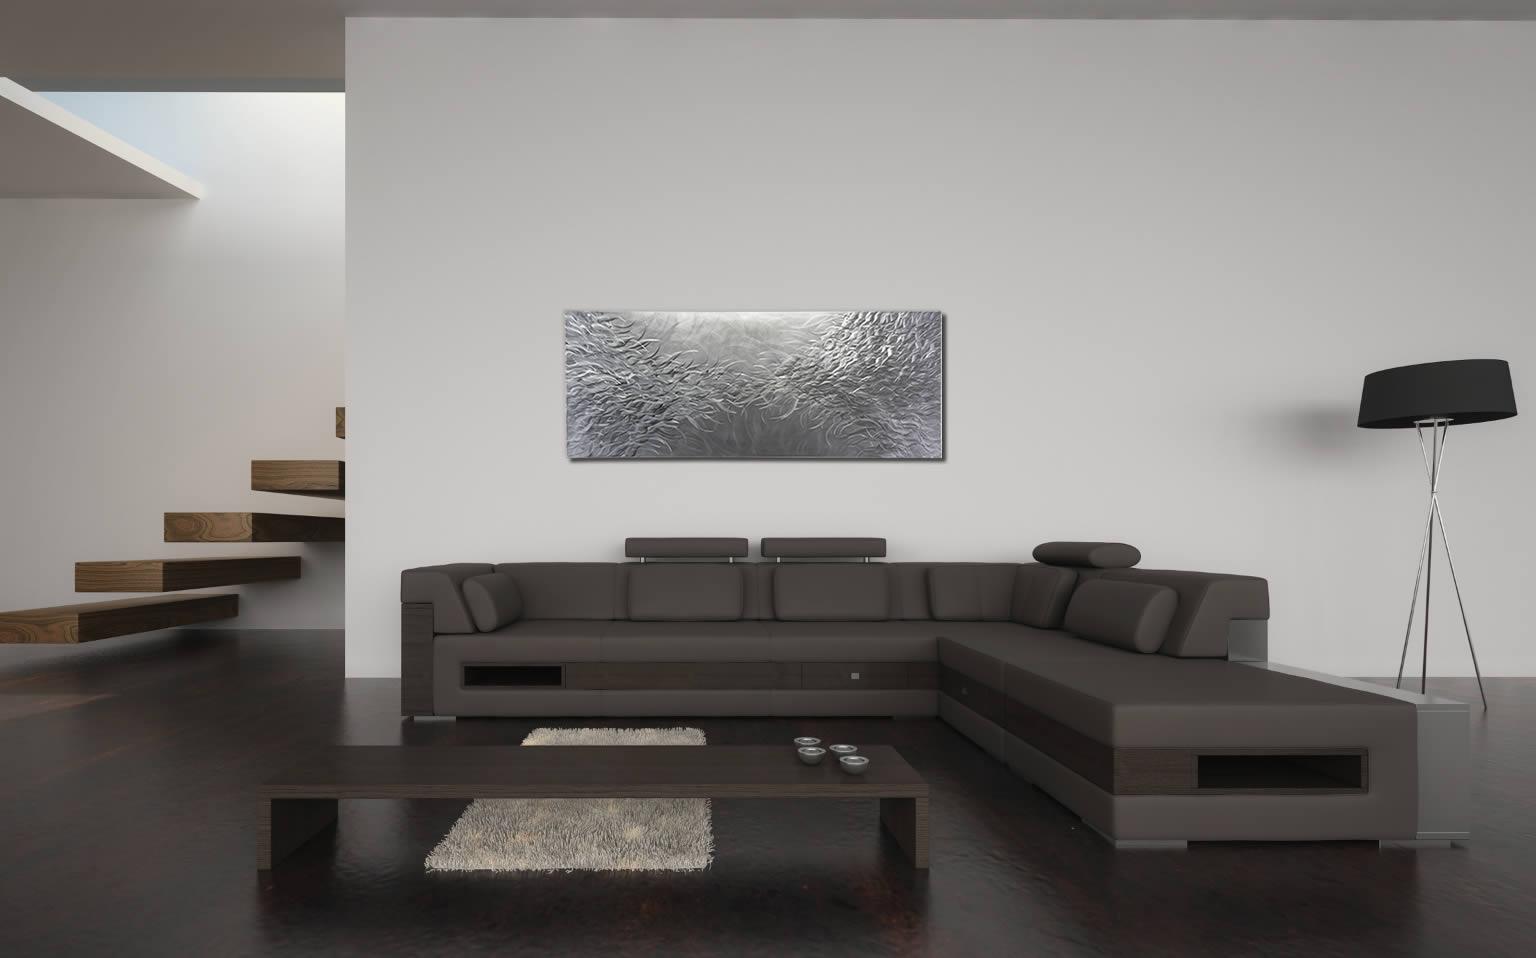 NY0536M - Metal Art by Nicholas Yust, Alternate Angle 1